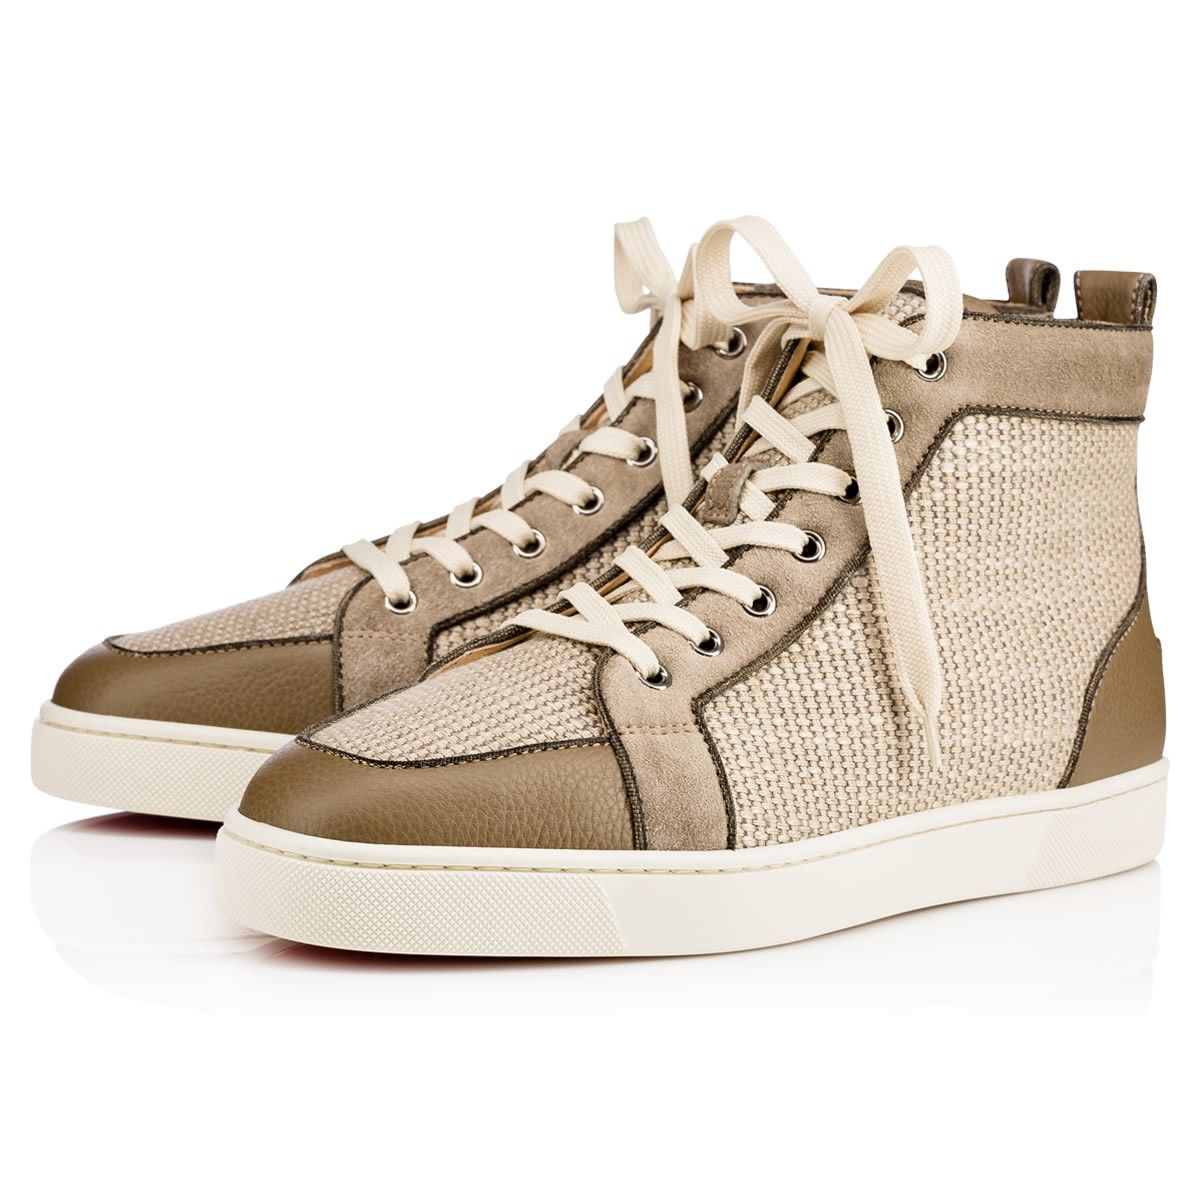 f3ac2f576f7 CHRISTIAN LOUBOUTIN RANTUS ORLATO CALF GRAINE LIN TRESSE Poivre Vert Linen  - Men Shoes - Christian Louboutin.  christianlouboutin  shoes